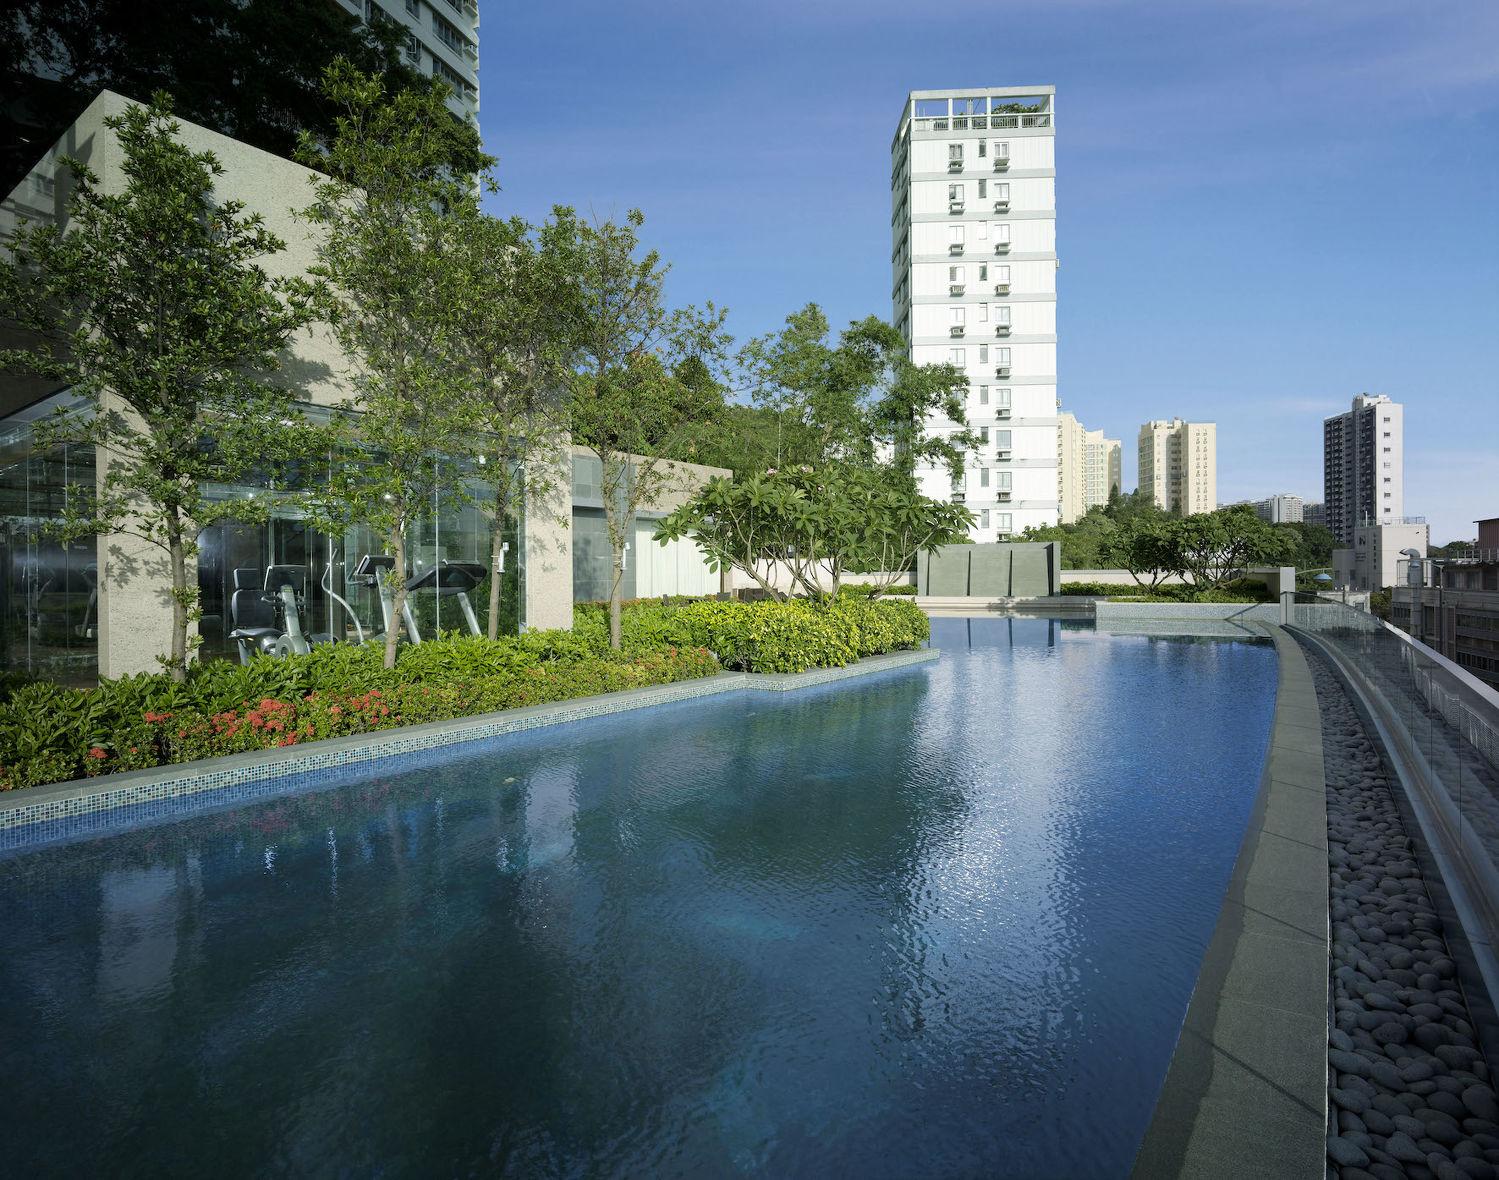 Radcliffe-PoolDay - EDGEPROP SINGAPORE